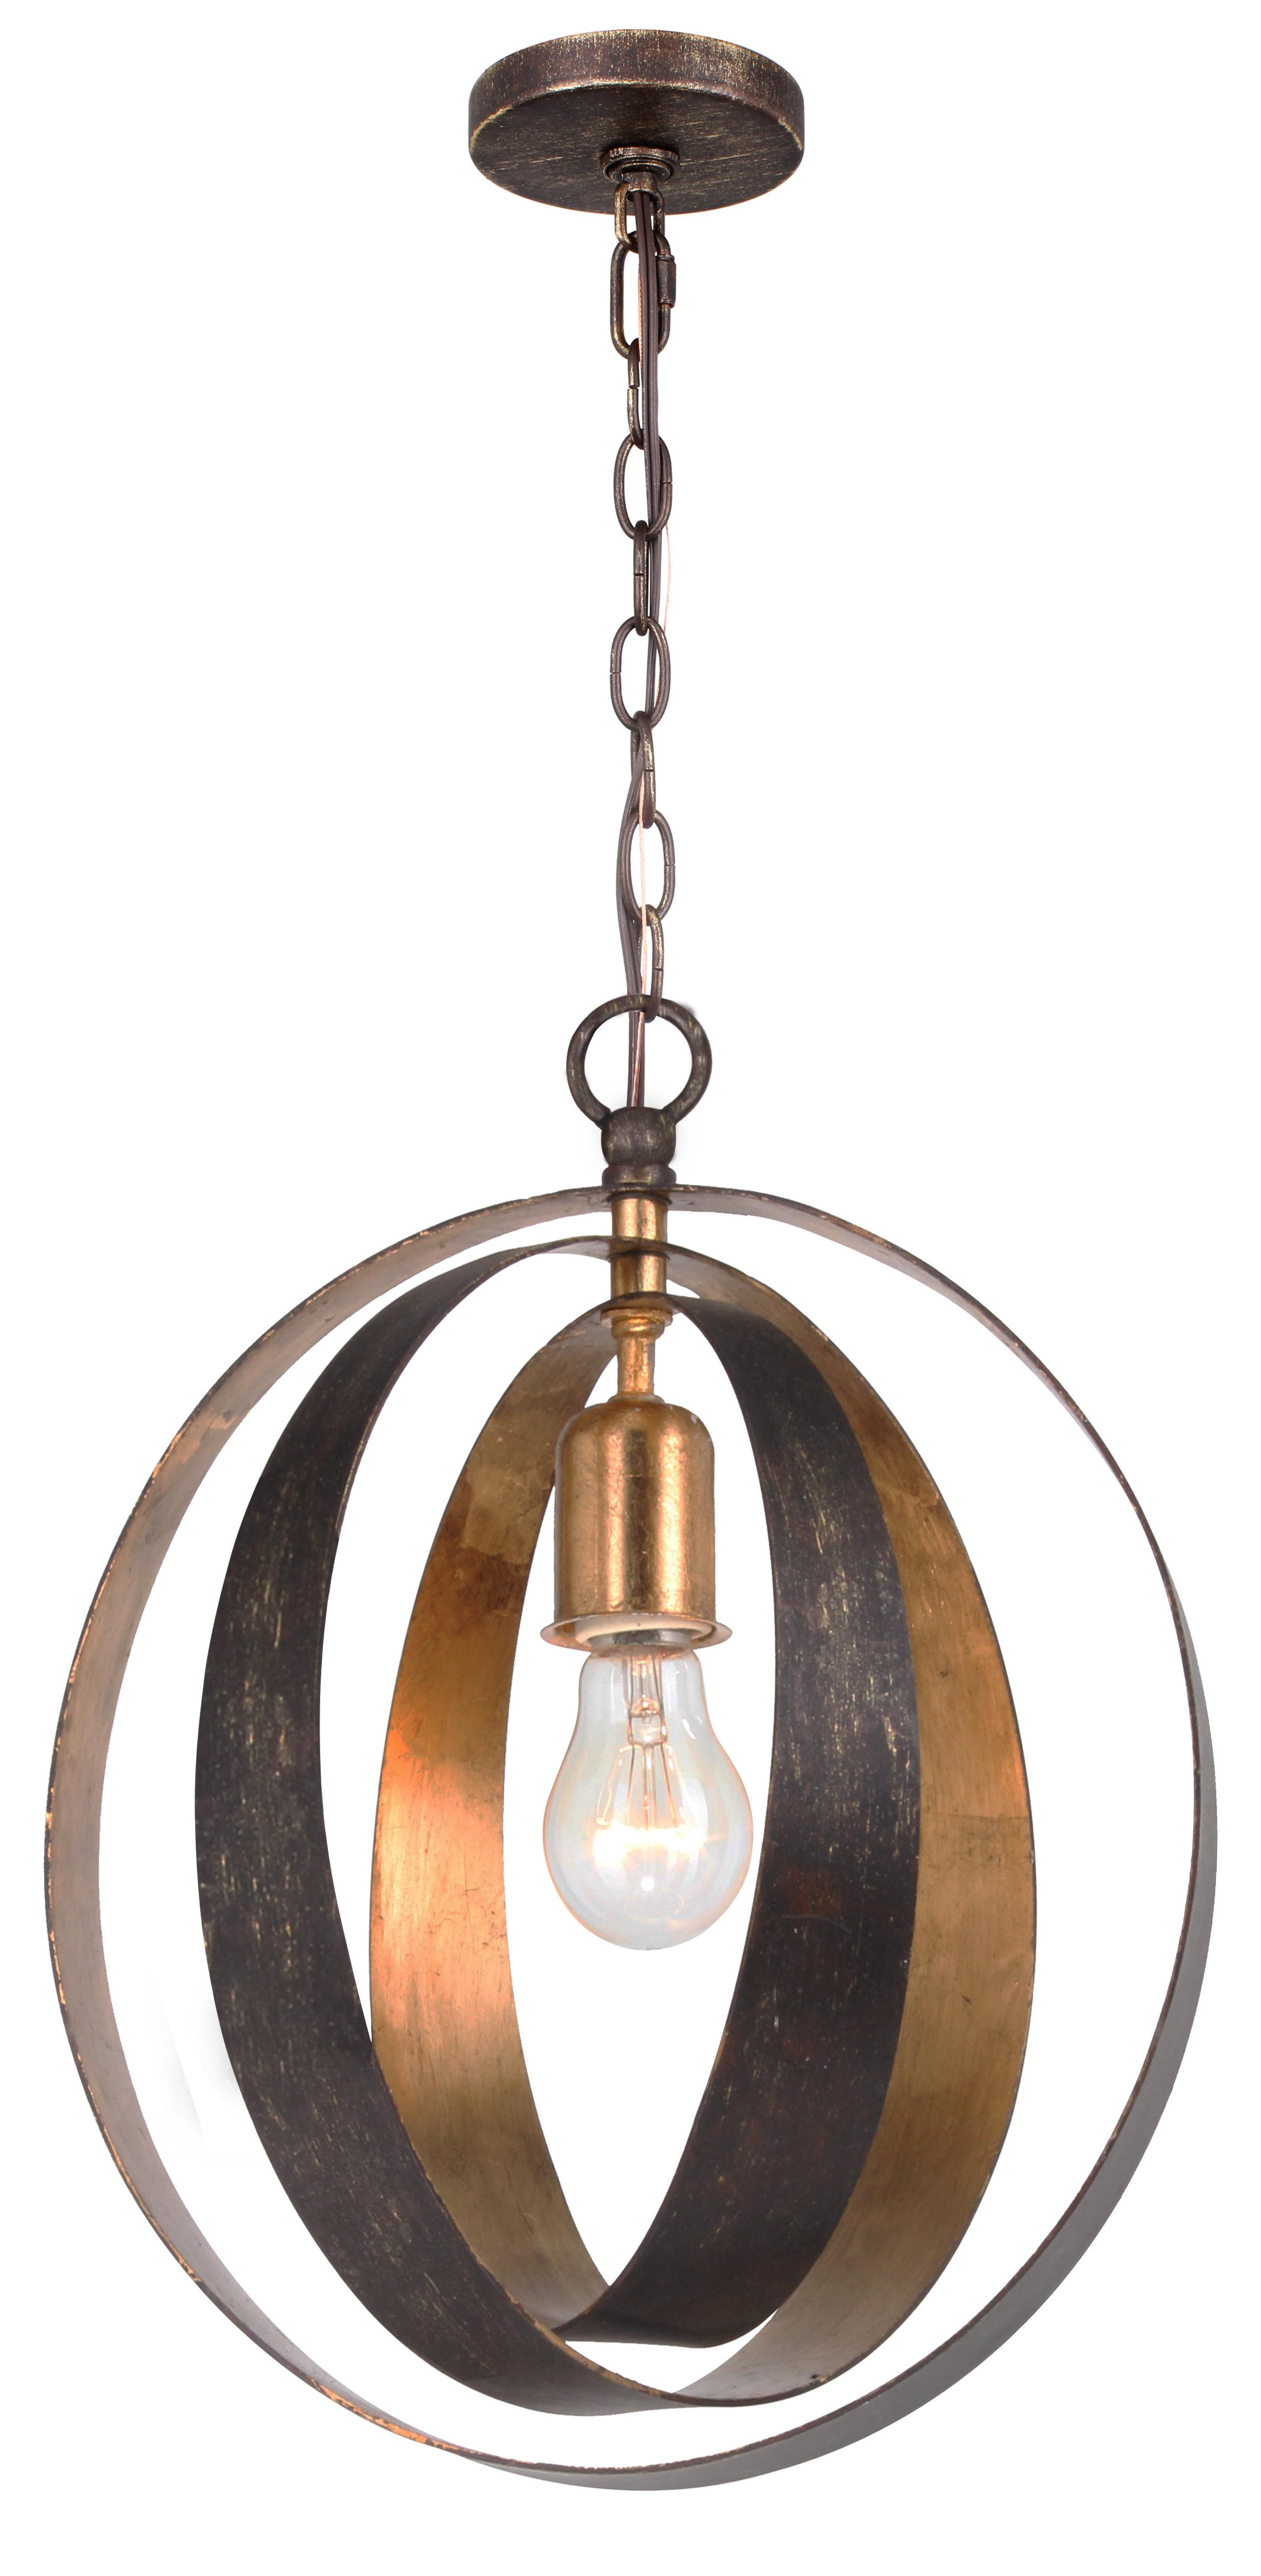 Recent Irwin 1-Light Single Globe Pendants with regard to Mason 1-Light Pendant